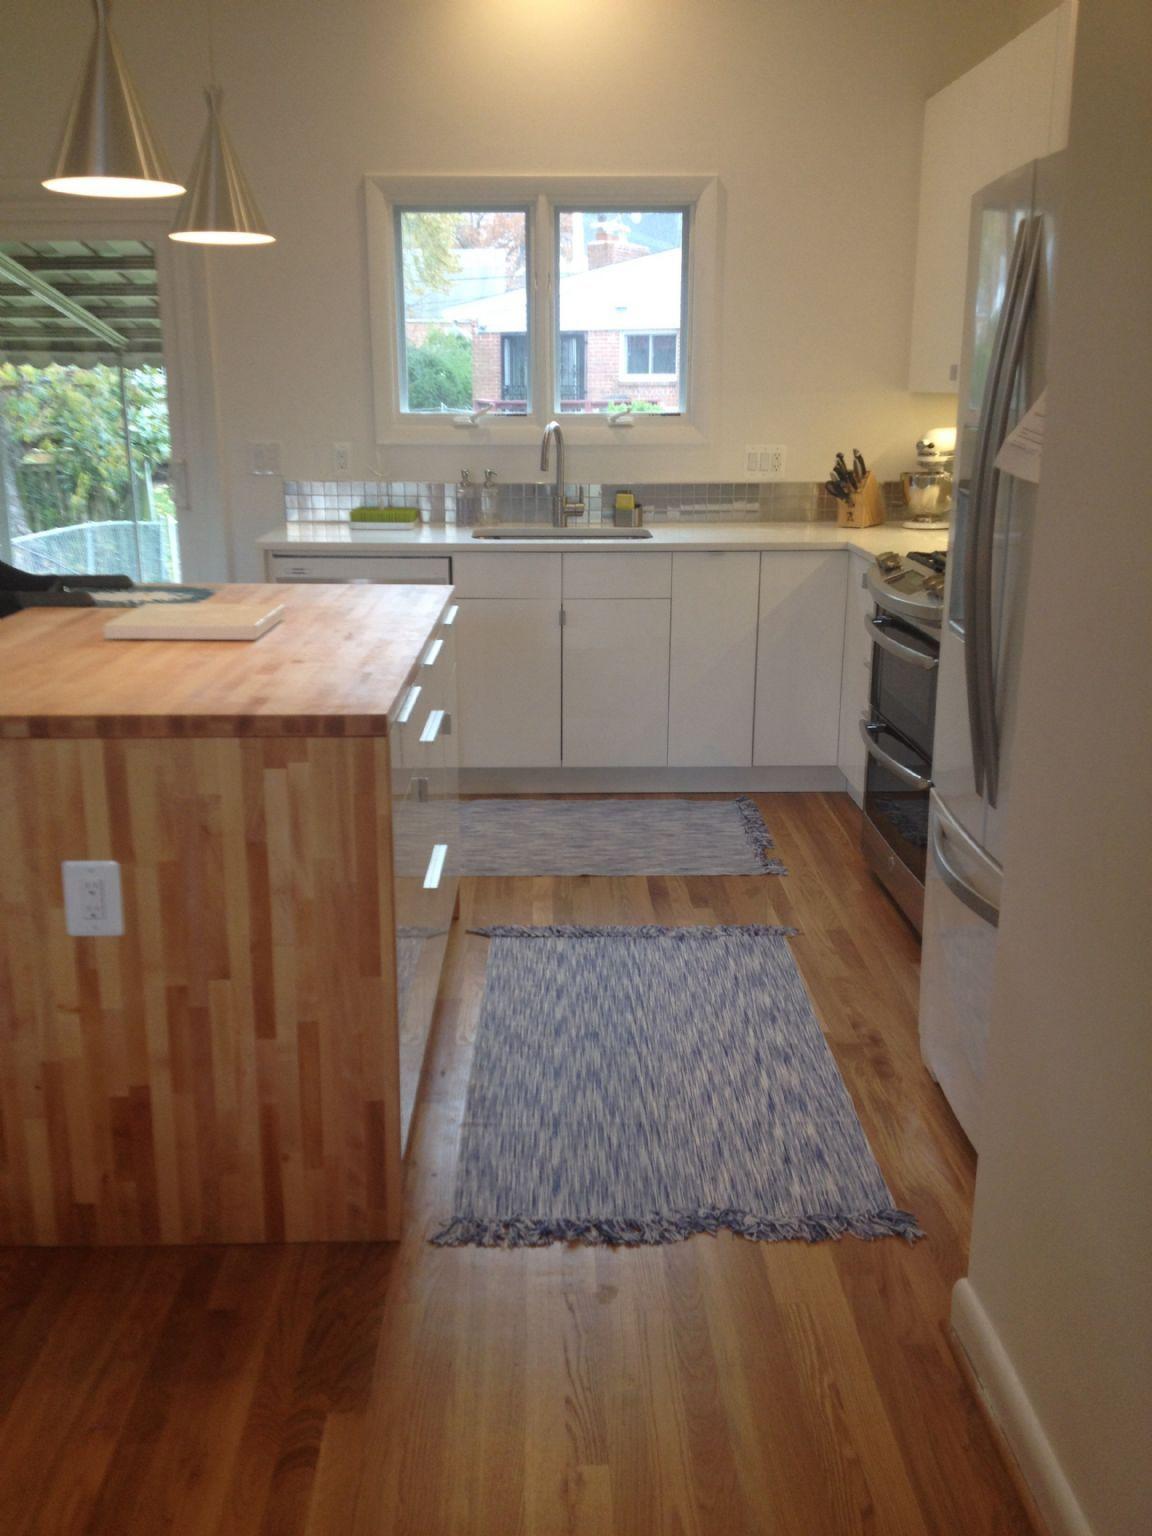 kitchen done ikea abstrakt cabinets ikea butcher block waterfall island whirlpool ice white. Black Bedroom Furniture Sets. Home Design Ideas